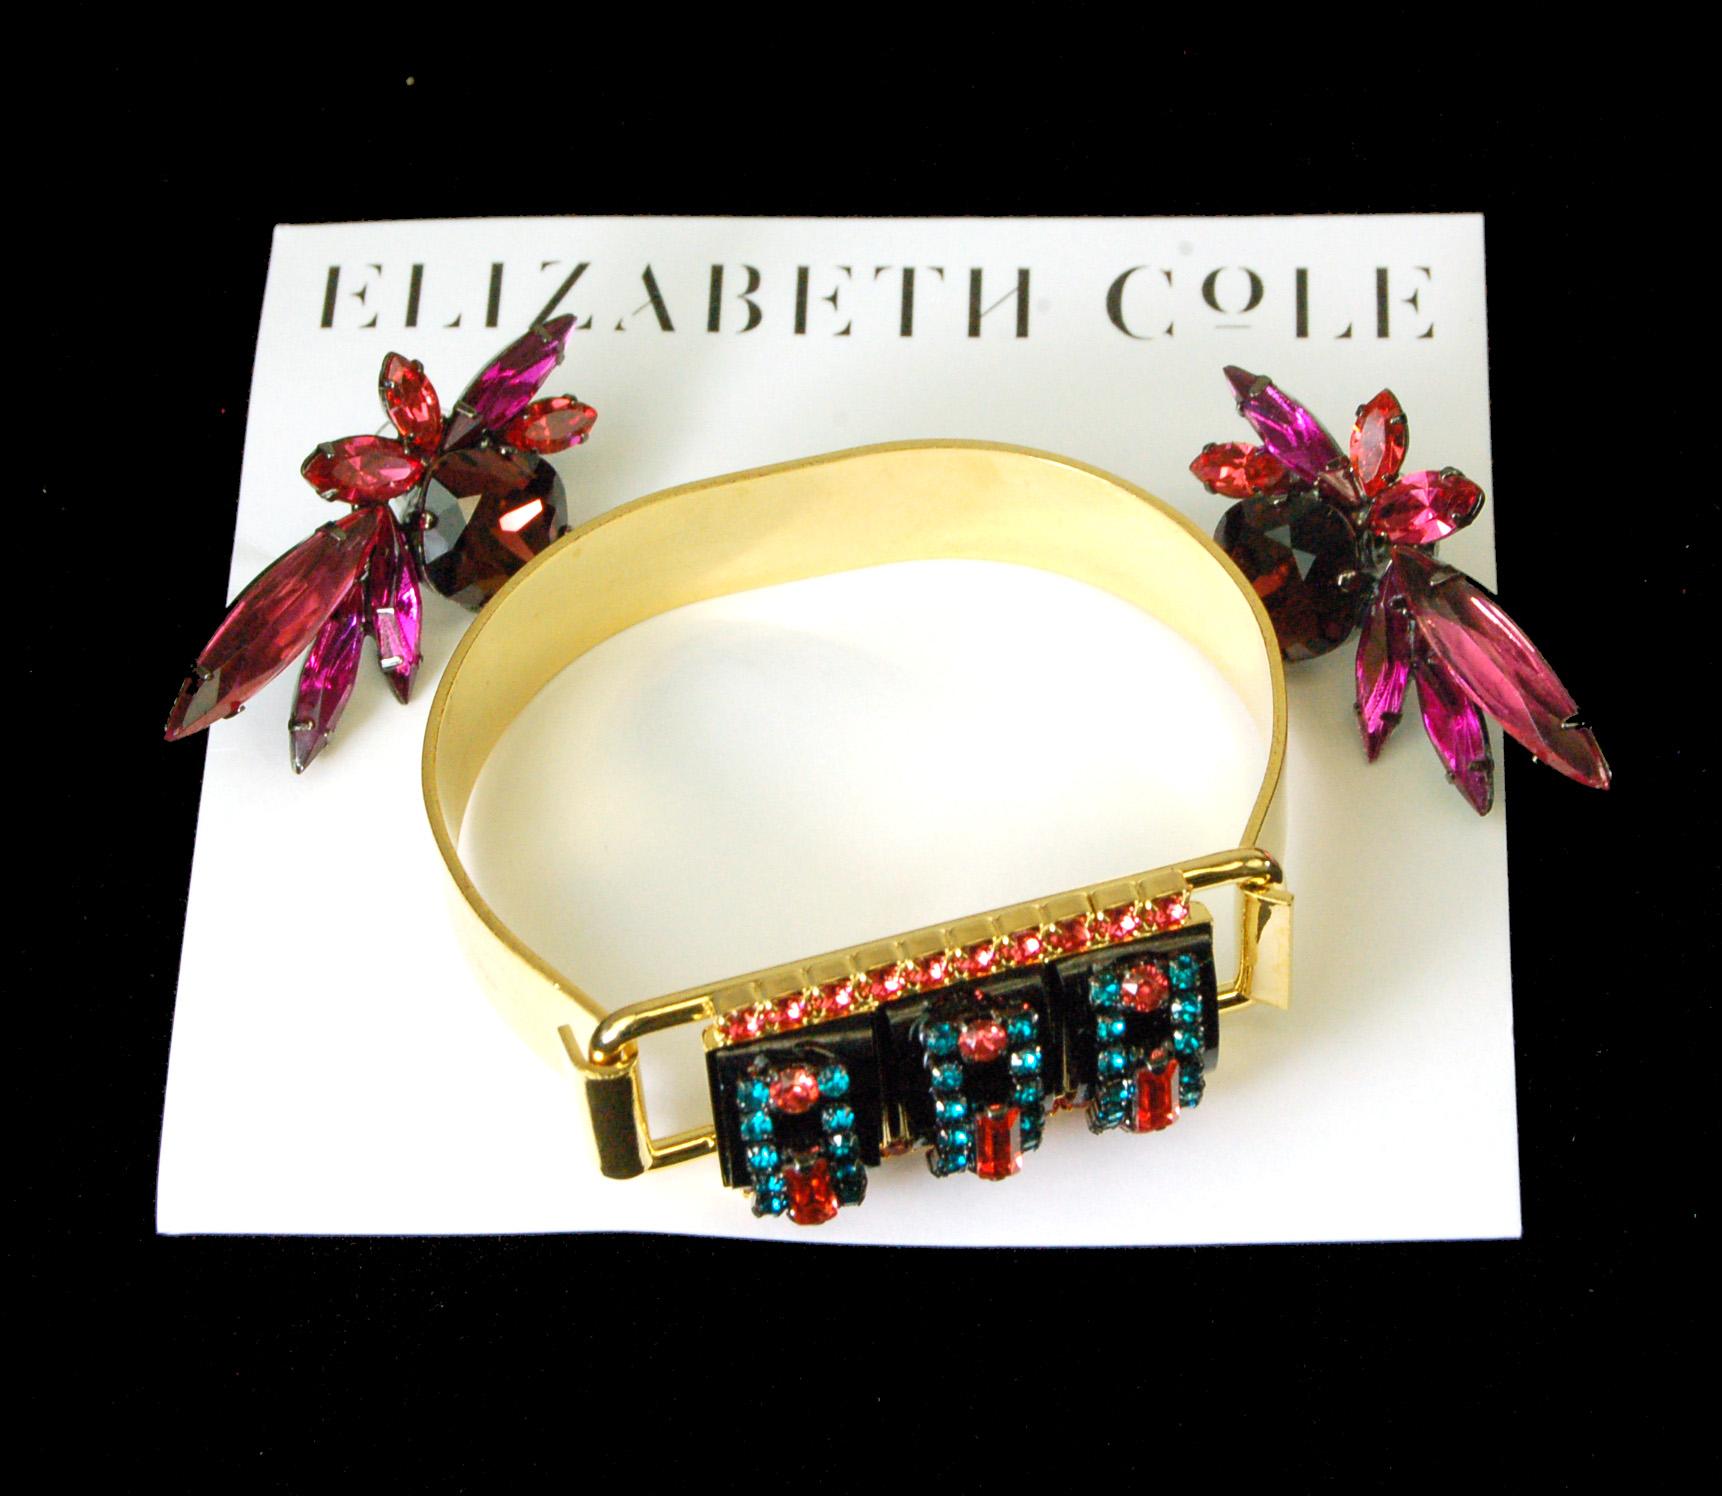 2 New Elizabeth Cole Jet Stone And Swarovski Crystal Gold Platrf Bracelet Earrings 14 Kt Plated 189 00 Retail